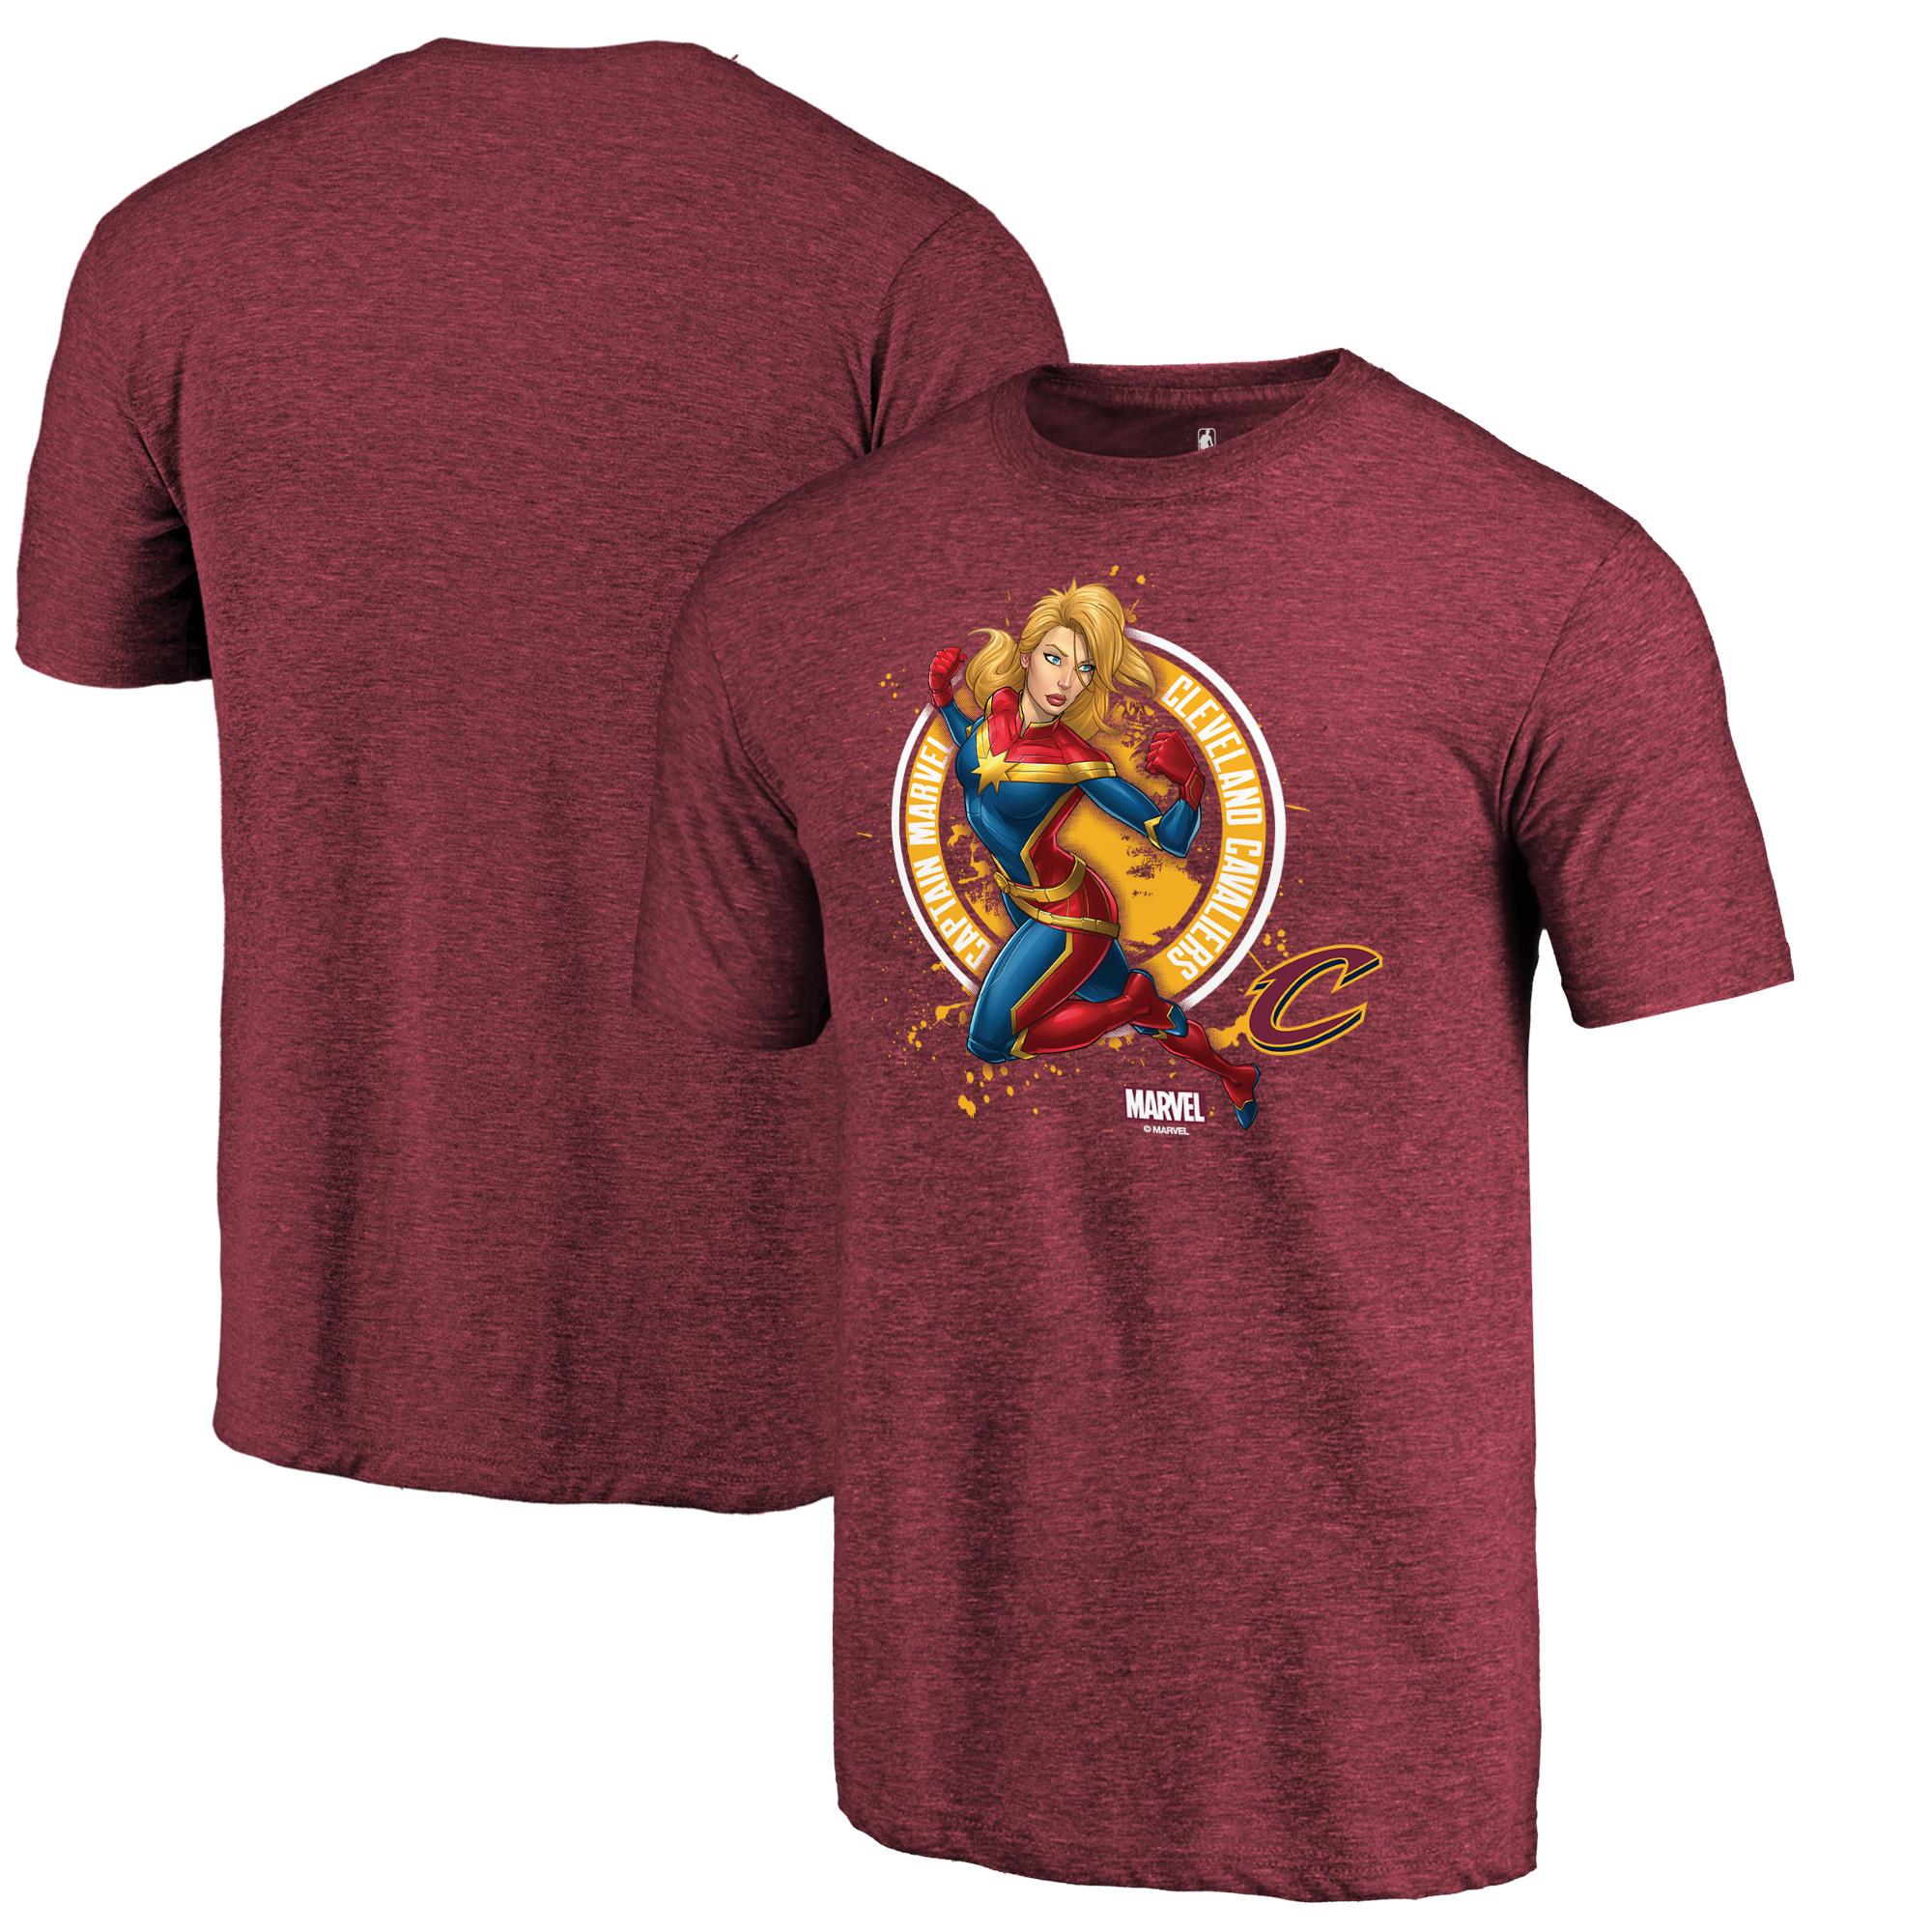 Cleveland Cavaliers Fanatics Branded Captain Marvel Seal Tri-Blend T-Shirt - Wine